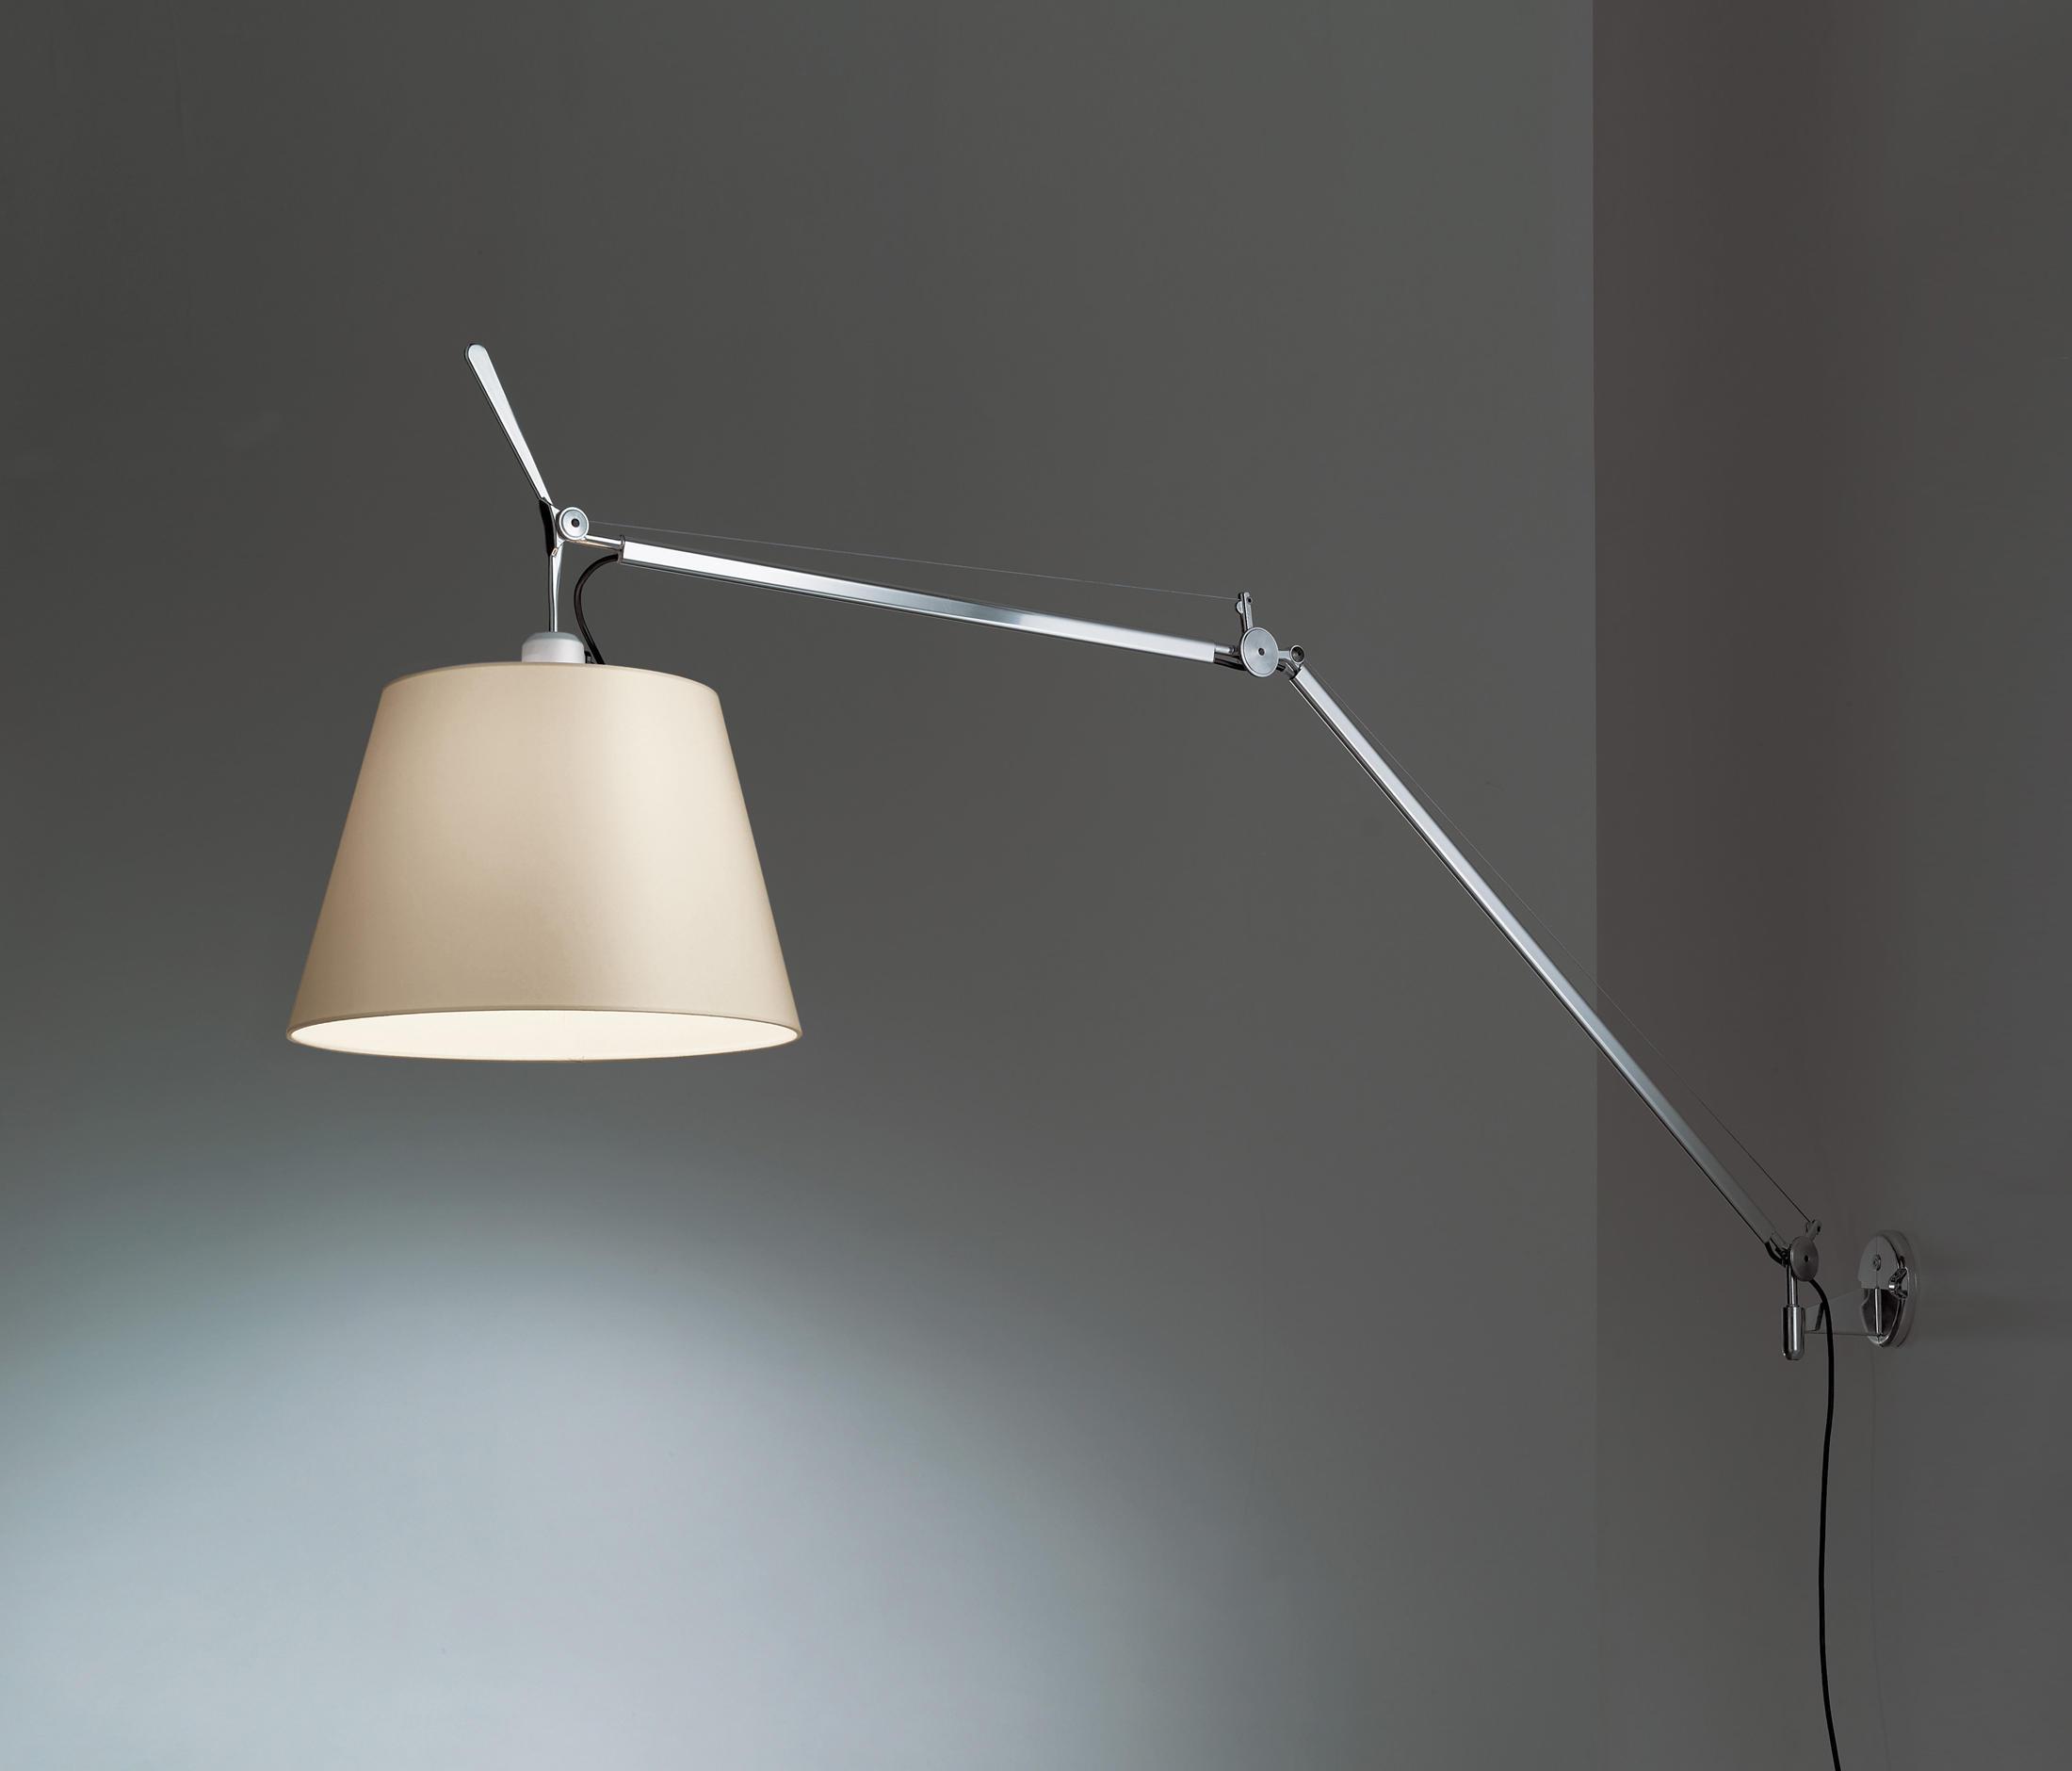 tolomeo mega wandleuchte allgemeinbeleuchtung von. Black Bedroom Furniture Sets. Home Design Ideas